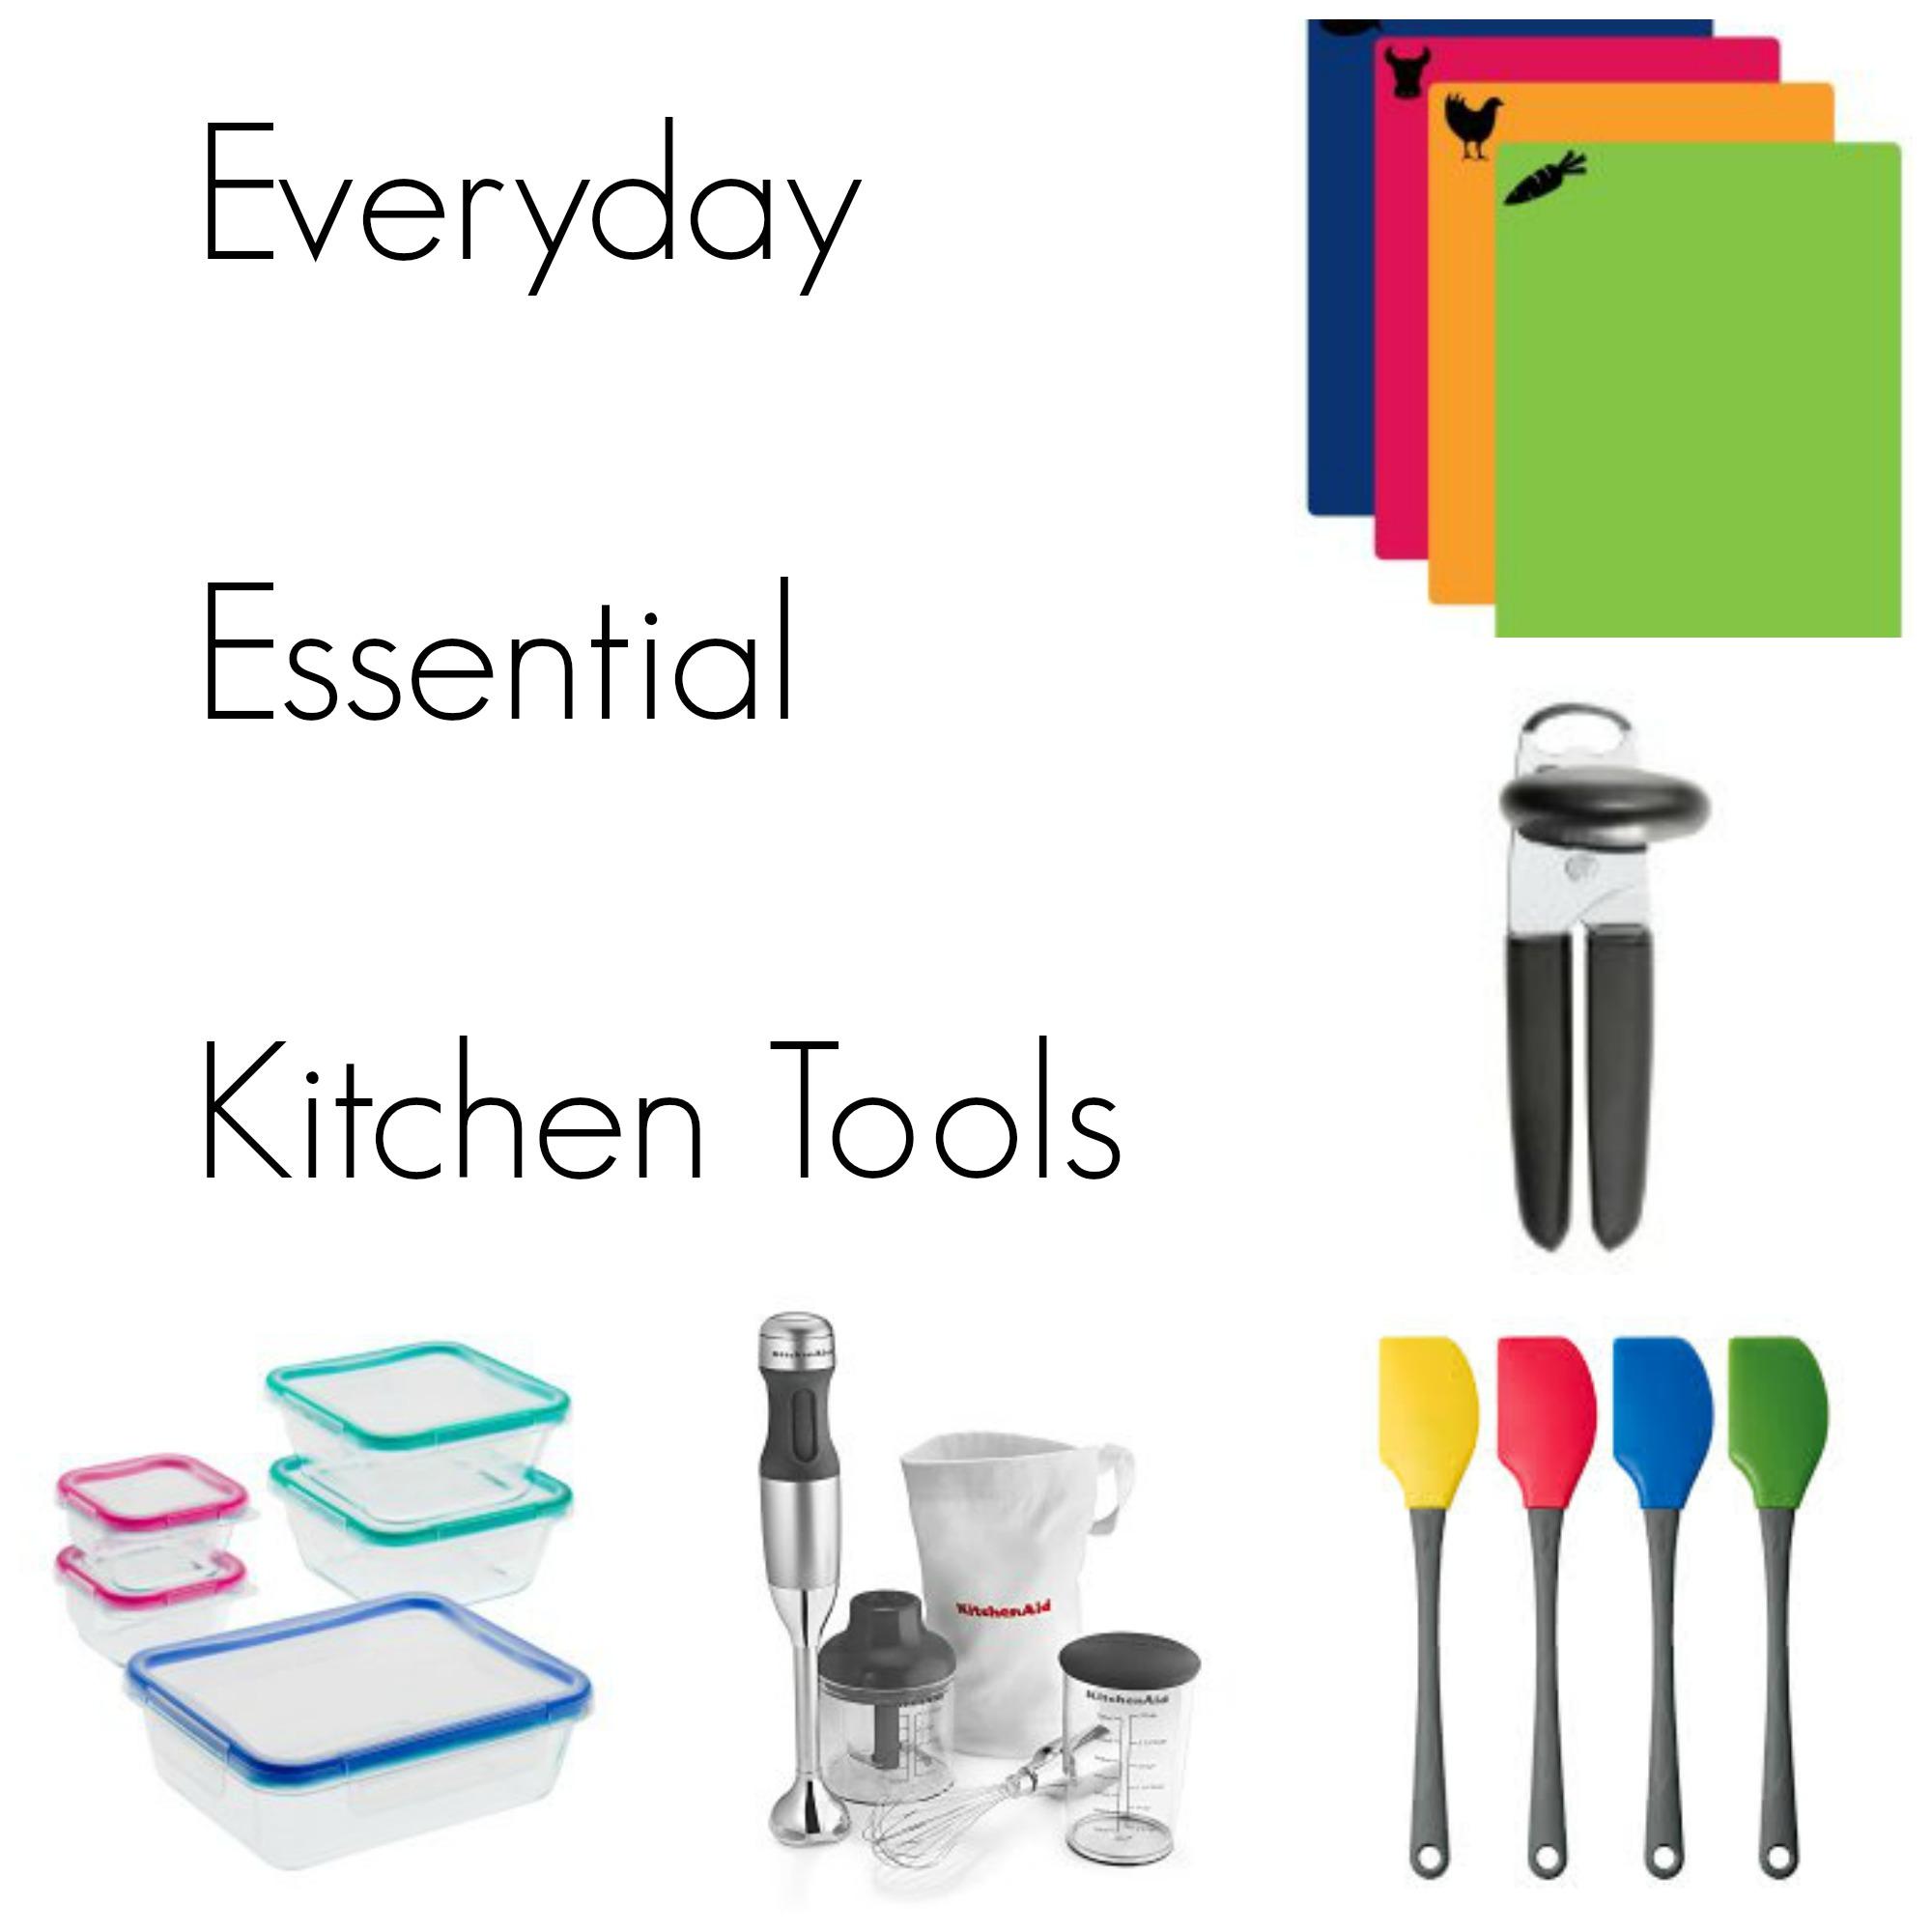 Everyday Essential Kitchen Tools — Food, Pleasure & Health